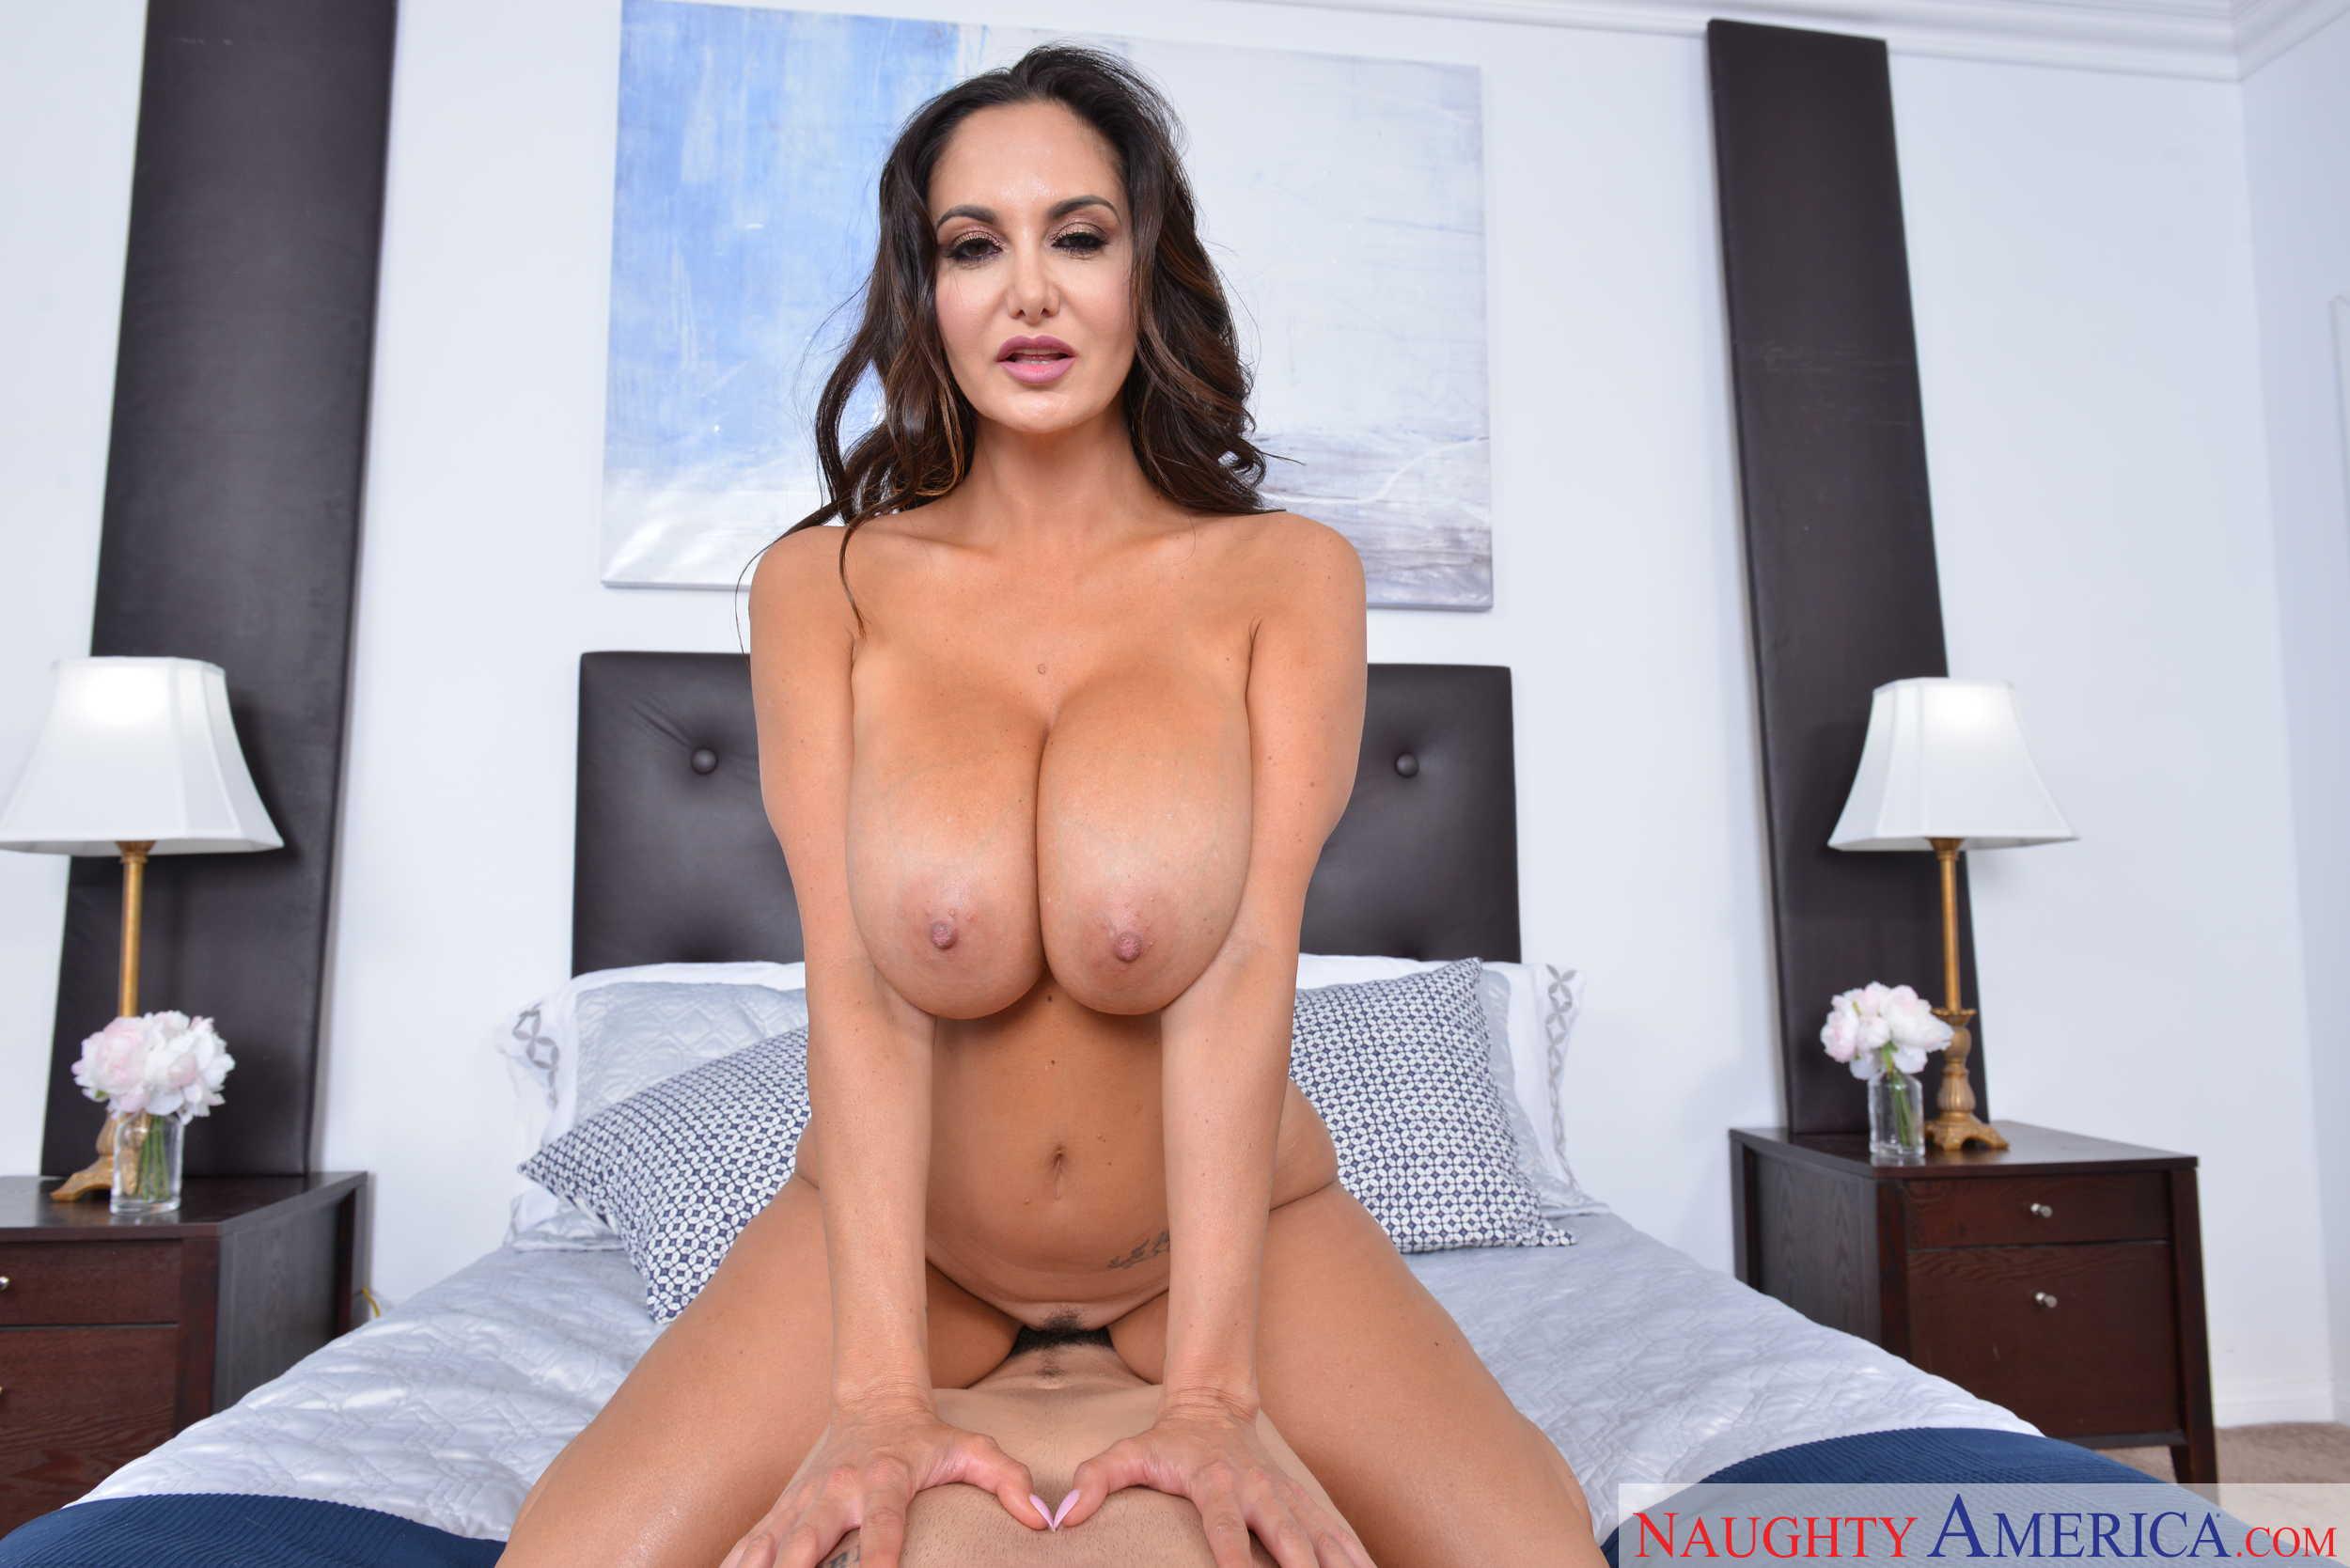 Porn Star Experience With Ava Addams - Vr 4 Porn-2099